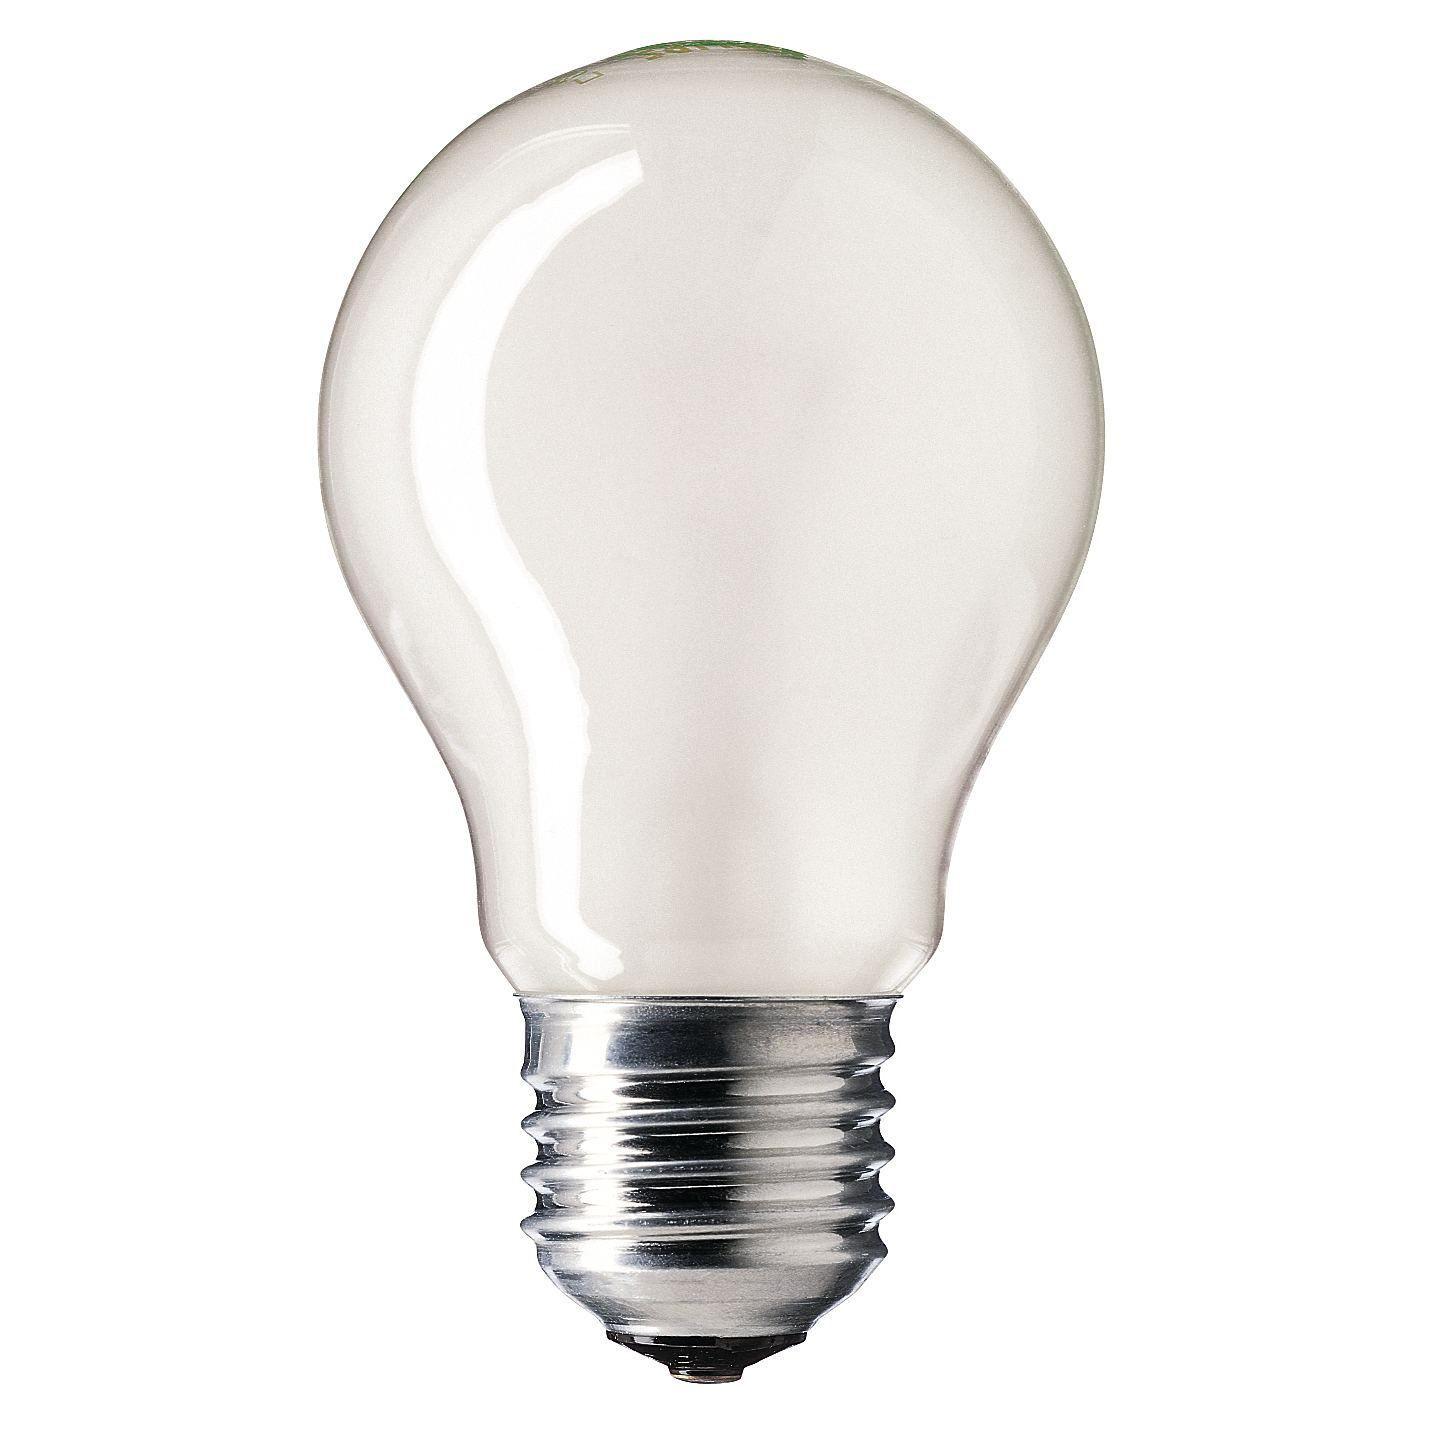 Купить Лампа накаливания Philips Stan 60W E27 230V A55 FR 1CT/12X10F матовая